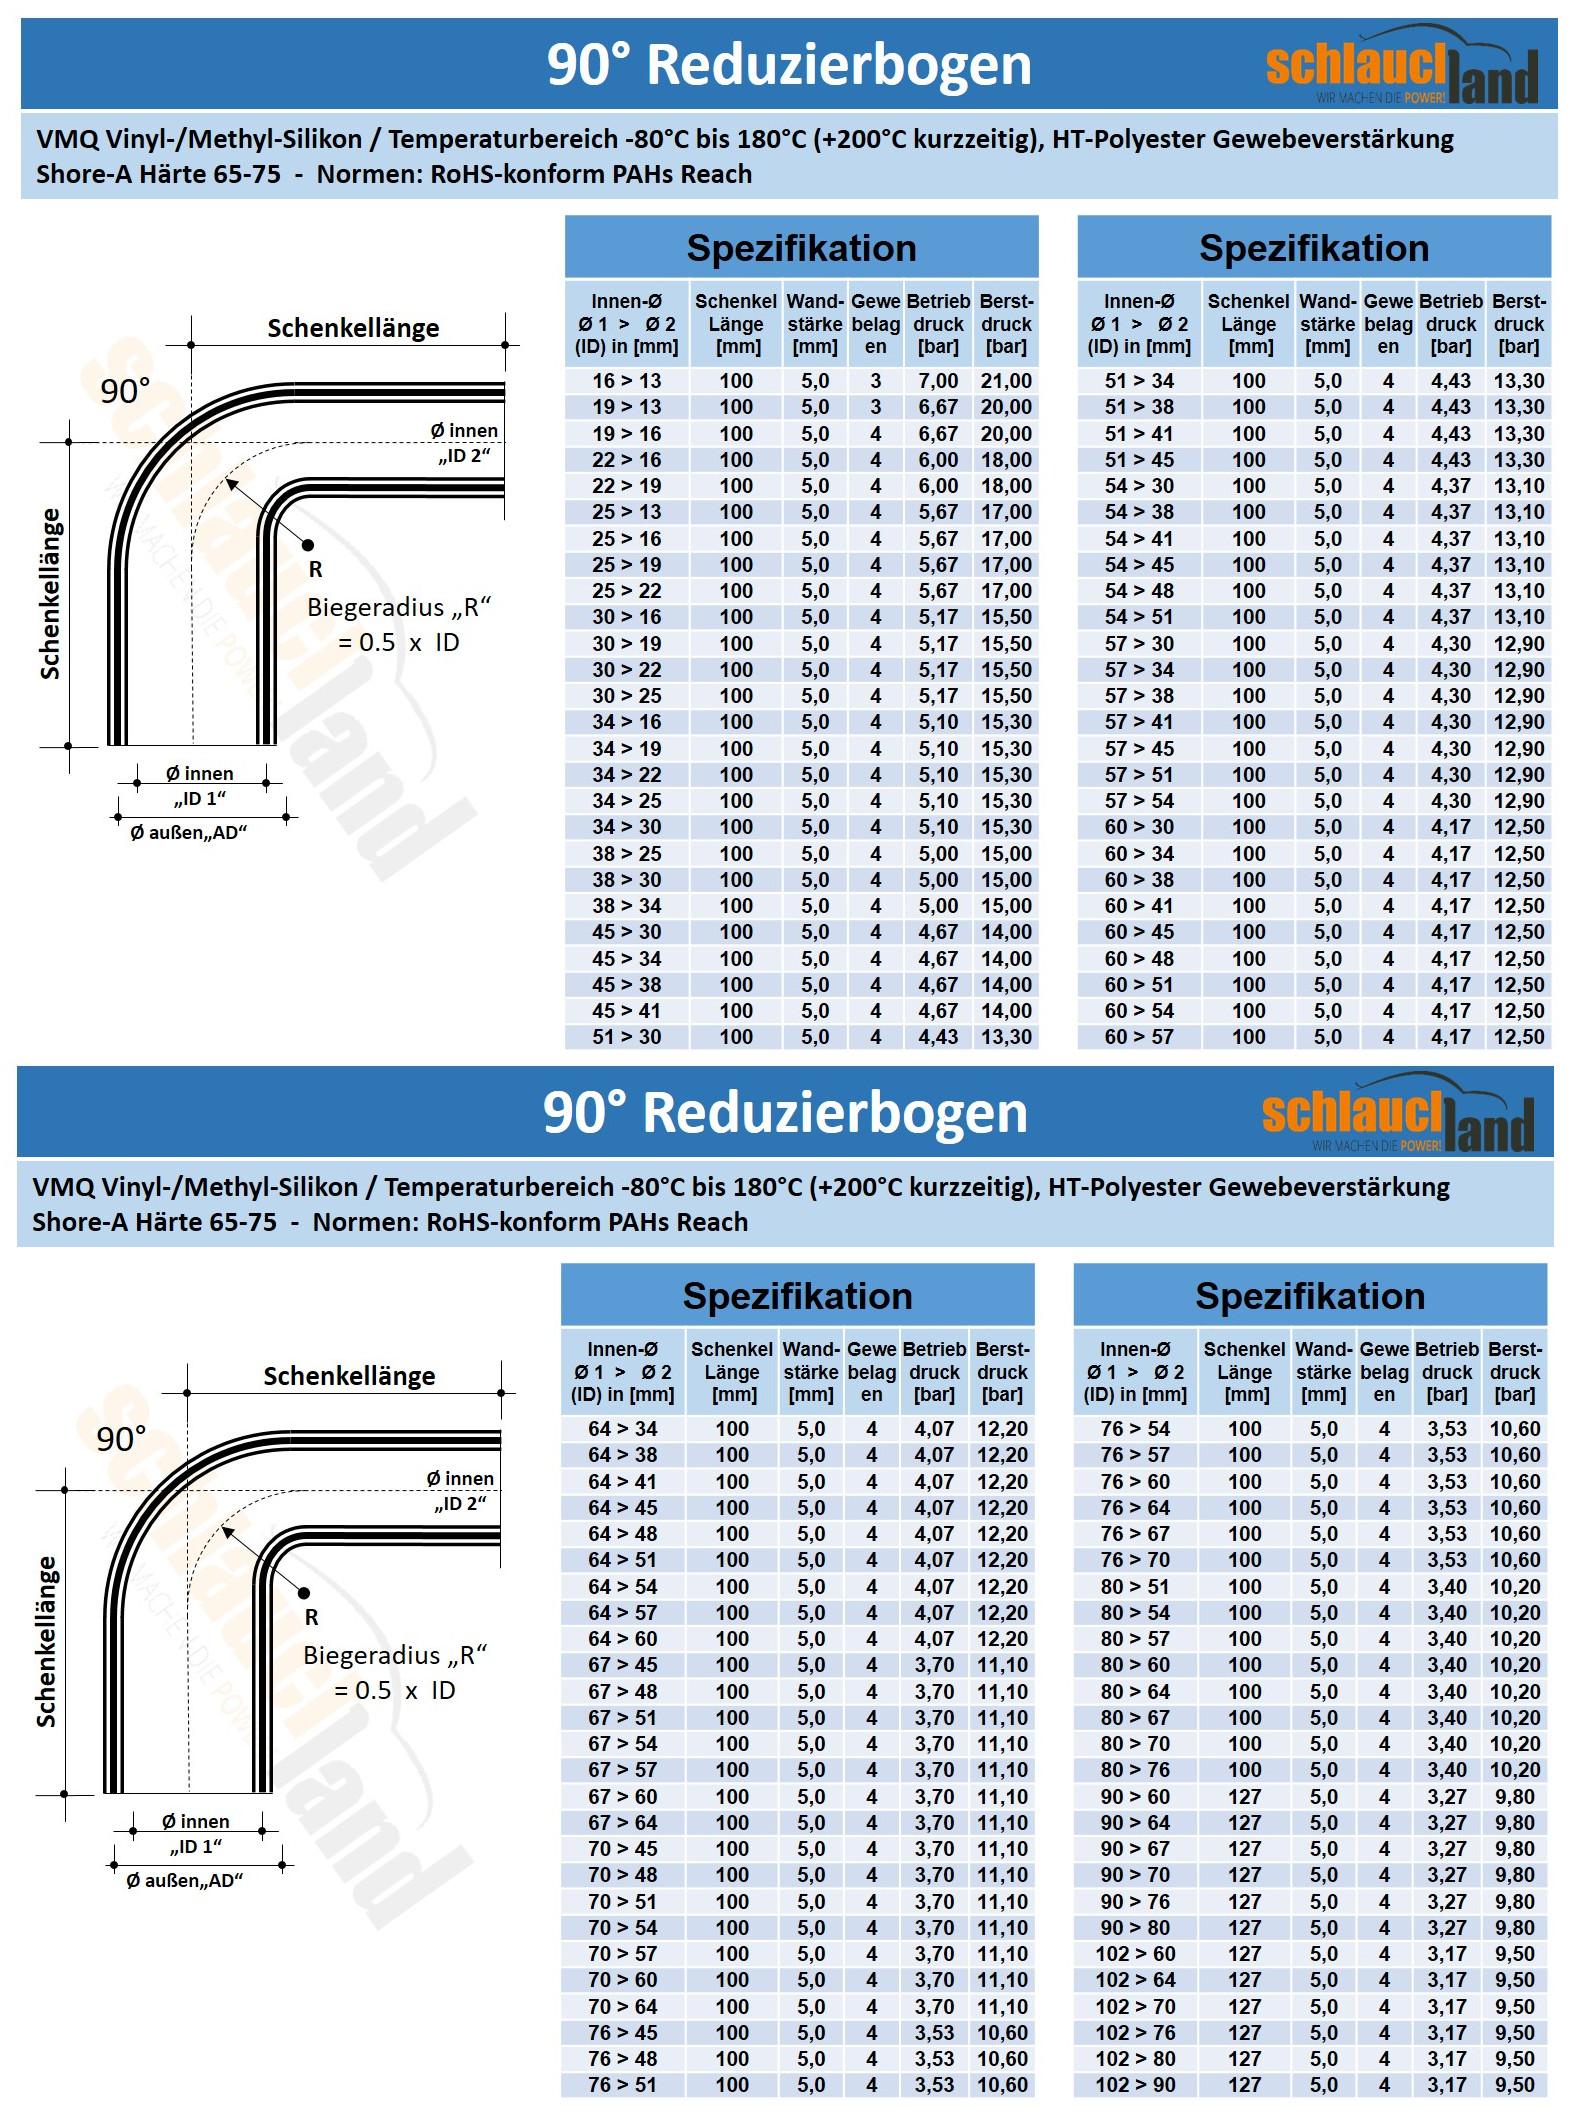 Datenblatt Silikon-Reduzierbogen 90°